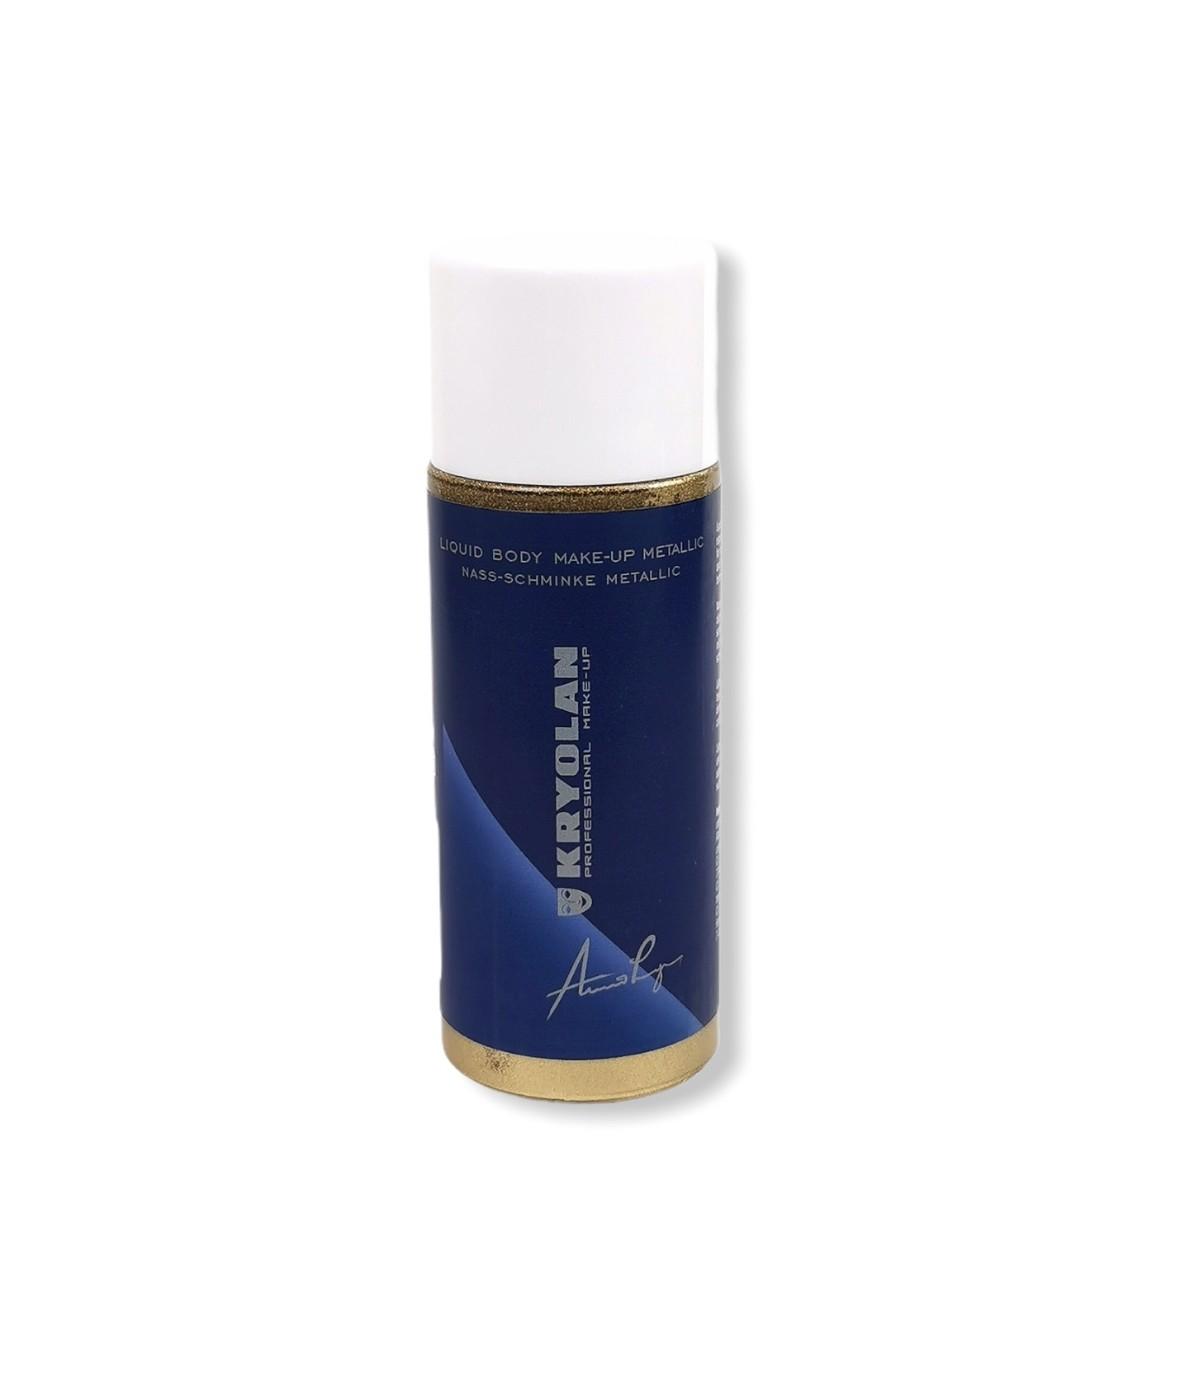 Kryolan Aquacolor Nass-Schminke, flüssig 100ml